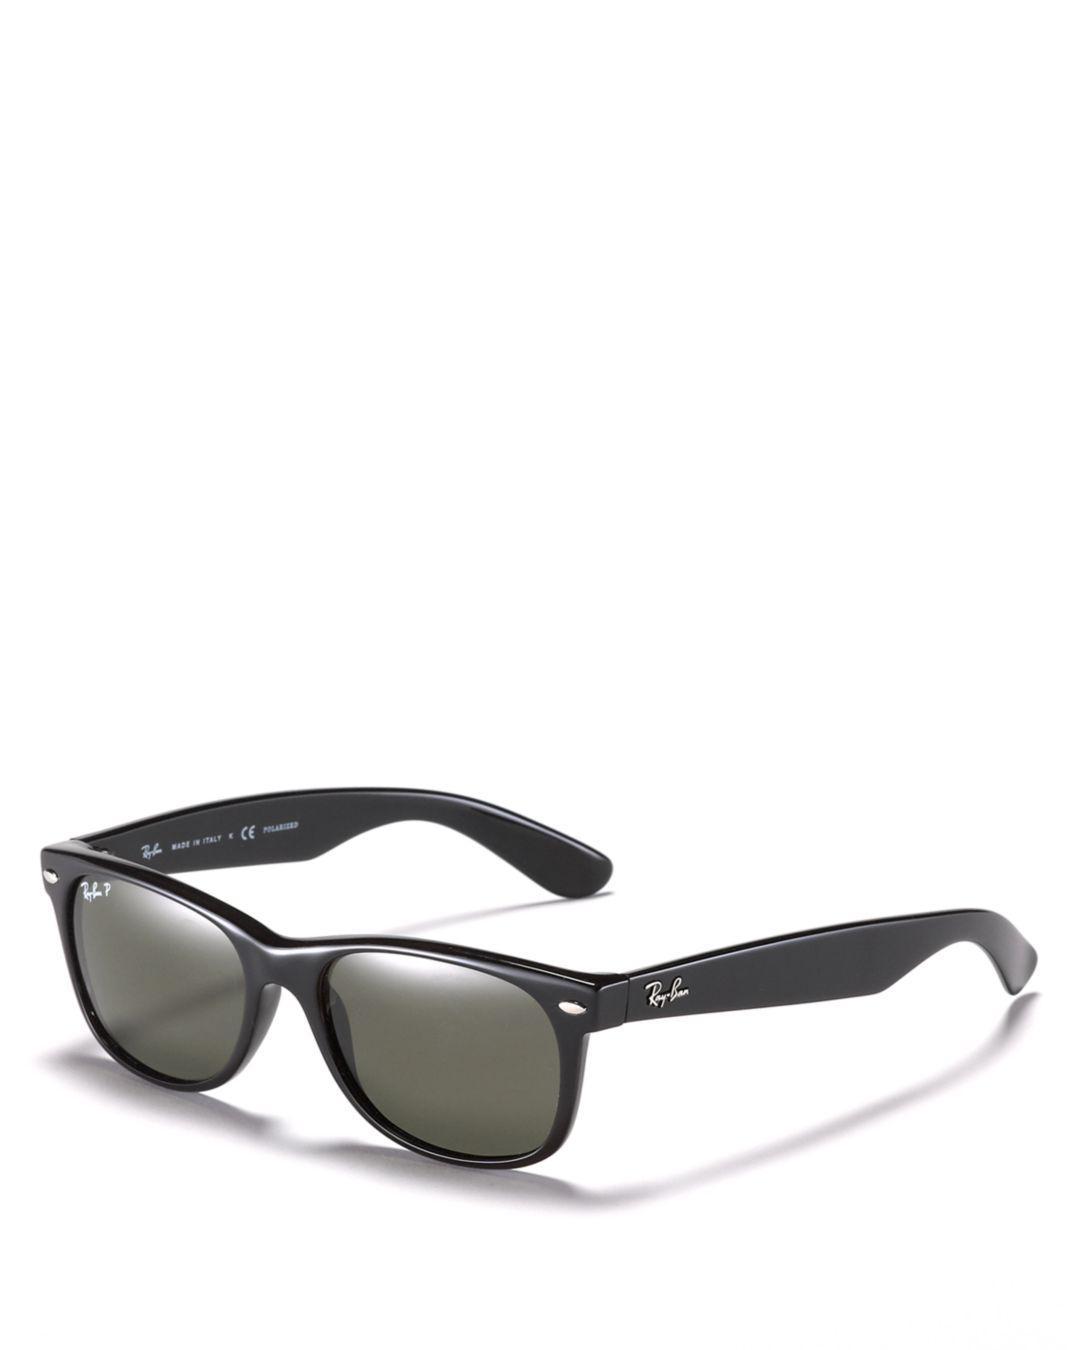 b015f55362 Lyst - Ray-Ban New Wayfarer Polarized Sunglasses in Black